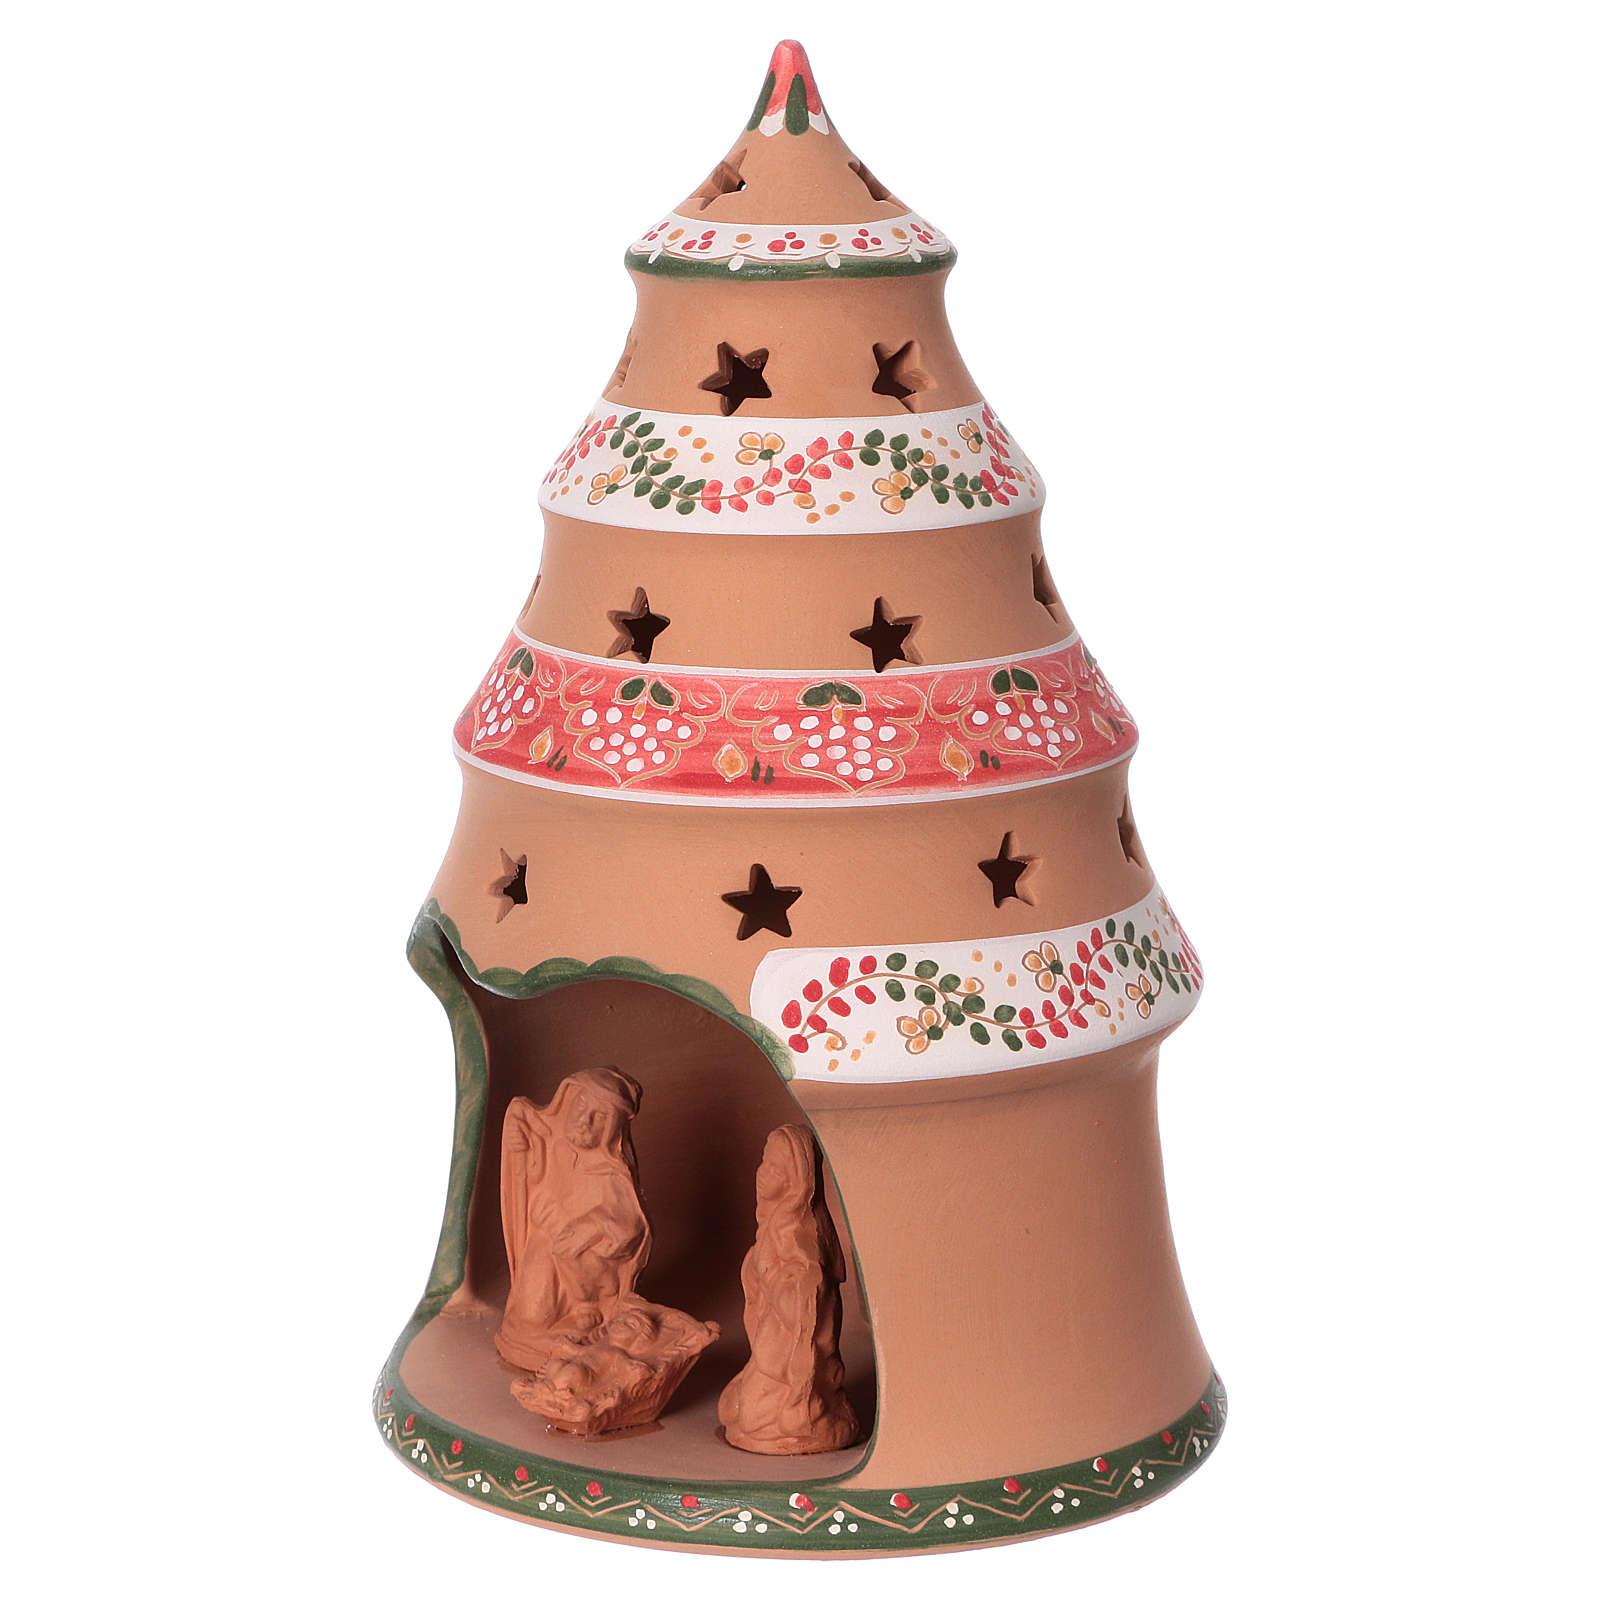 Christmas tree 25x15x15 cm with 7 cm nativity scene, country style in Deruta ceramic 4